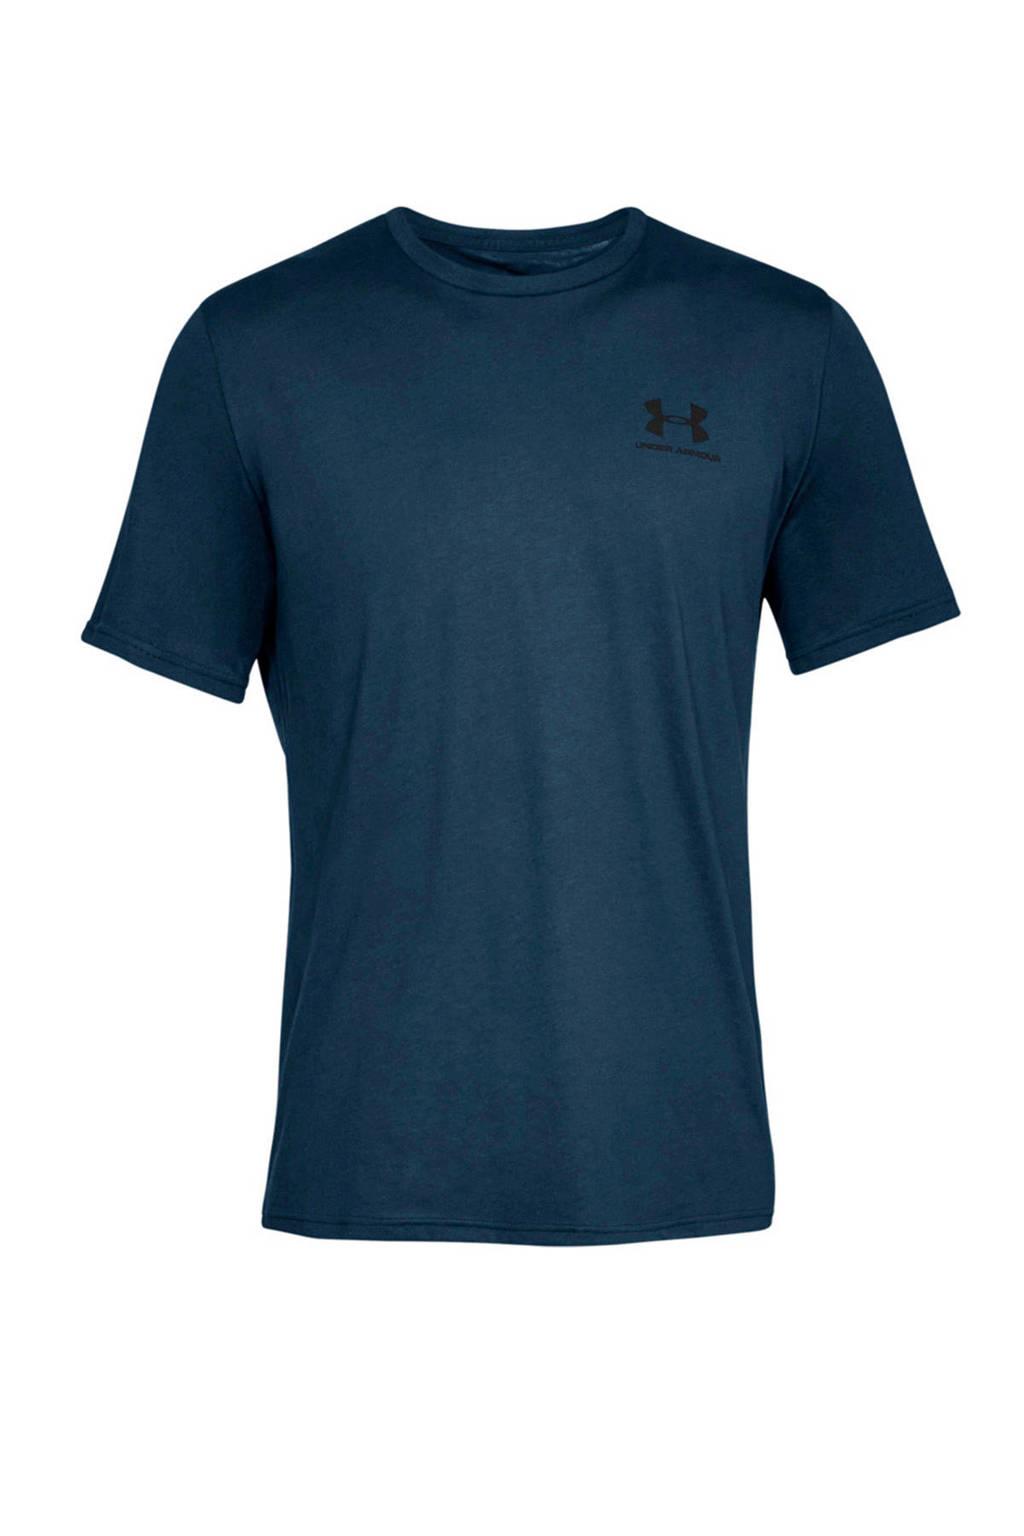 Under Armour   sport T-shirt donkerblauw, Donkerblauw